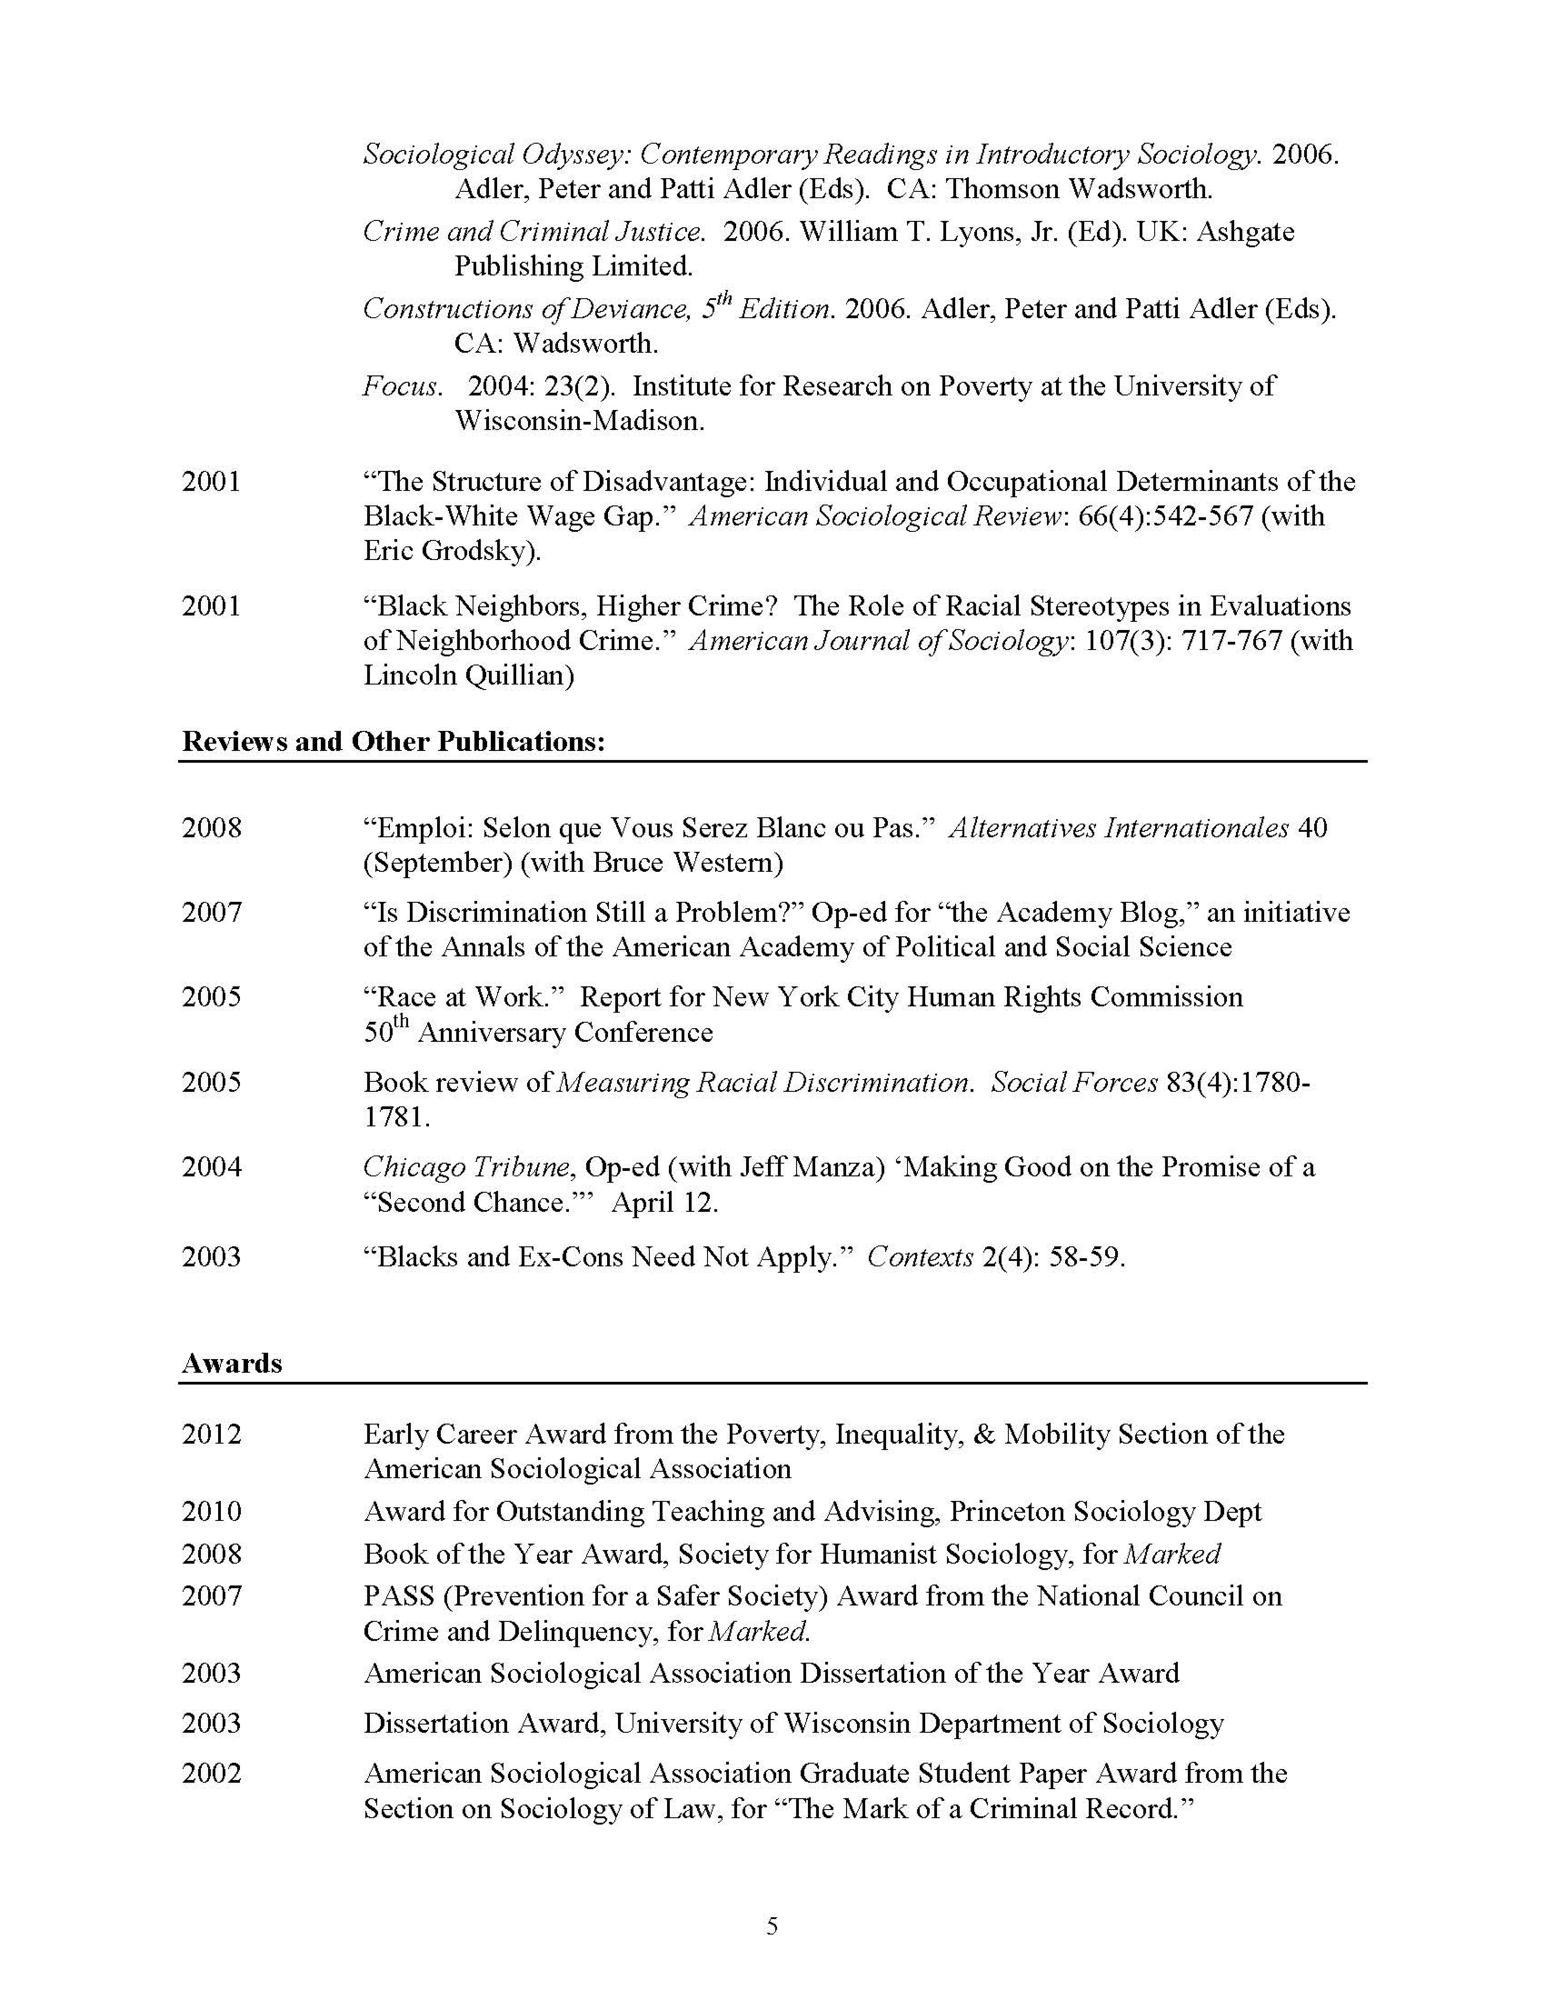 dpager_cv_1215_page_05 Oksana Didyuk M D Curriculum Vitae on